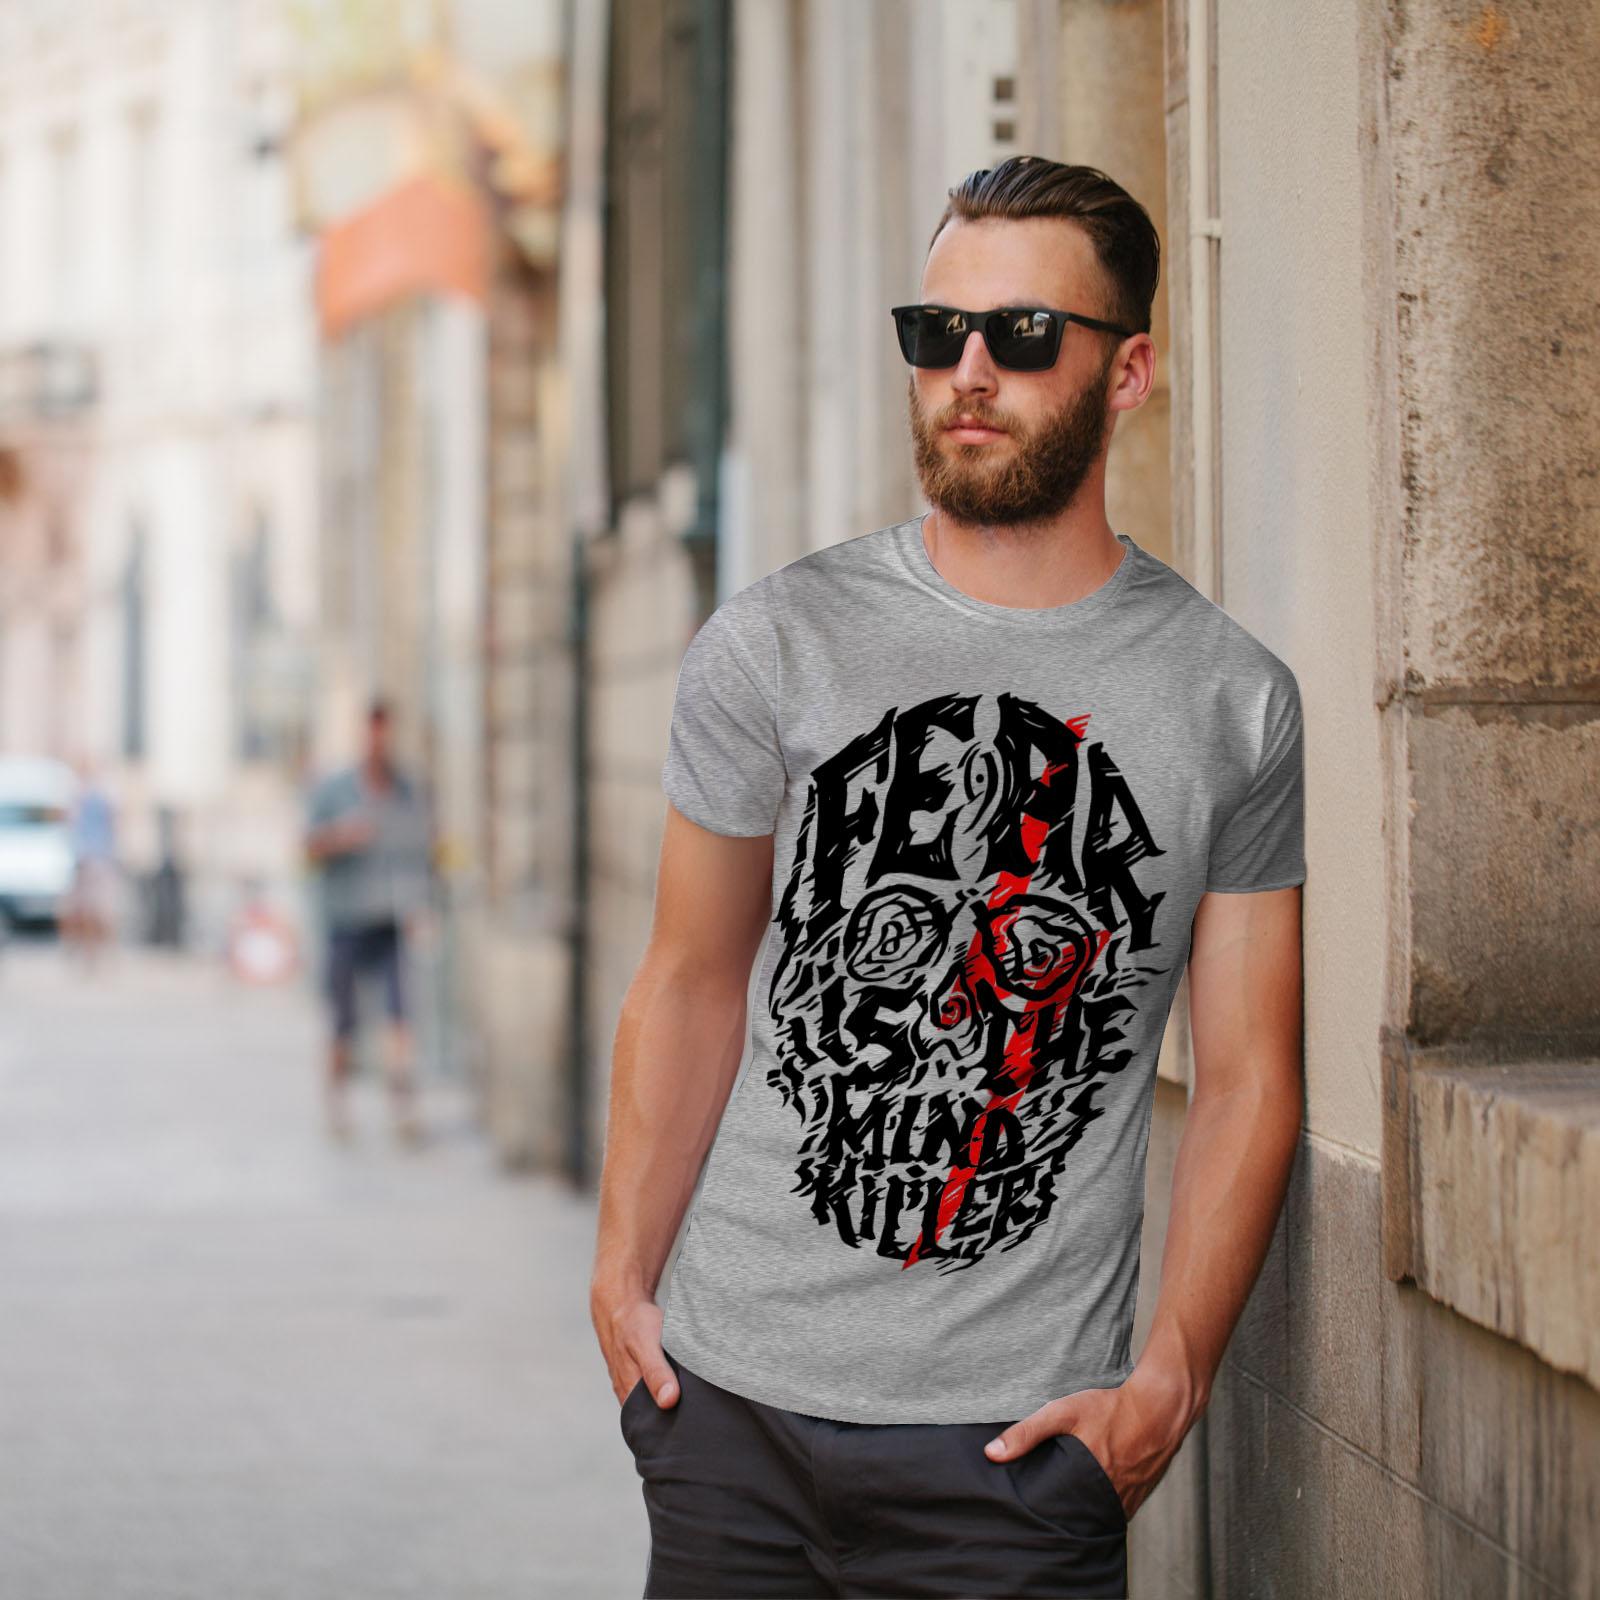 Skeleton Graphic Design Printed Tee Wellcoda Fear Mind Killer Mens T-shirt